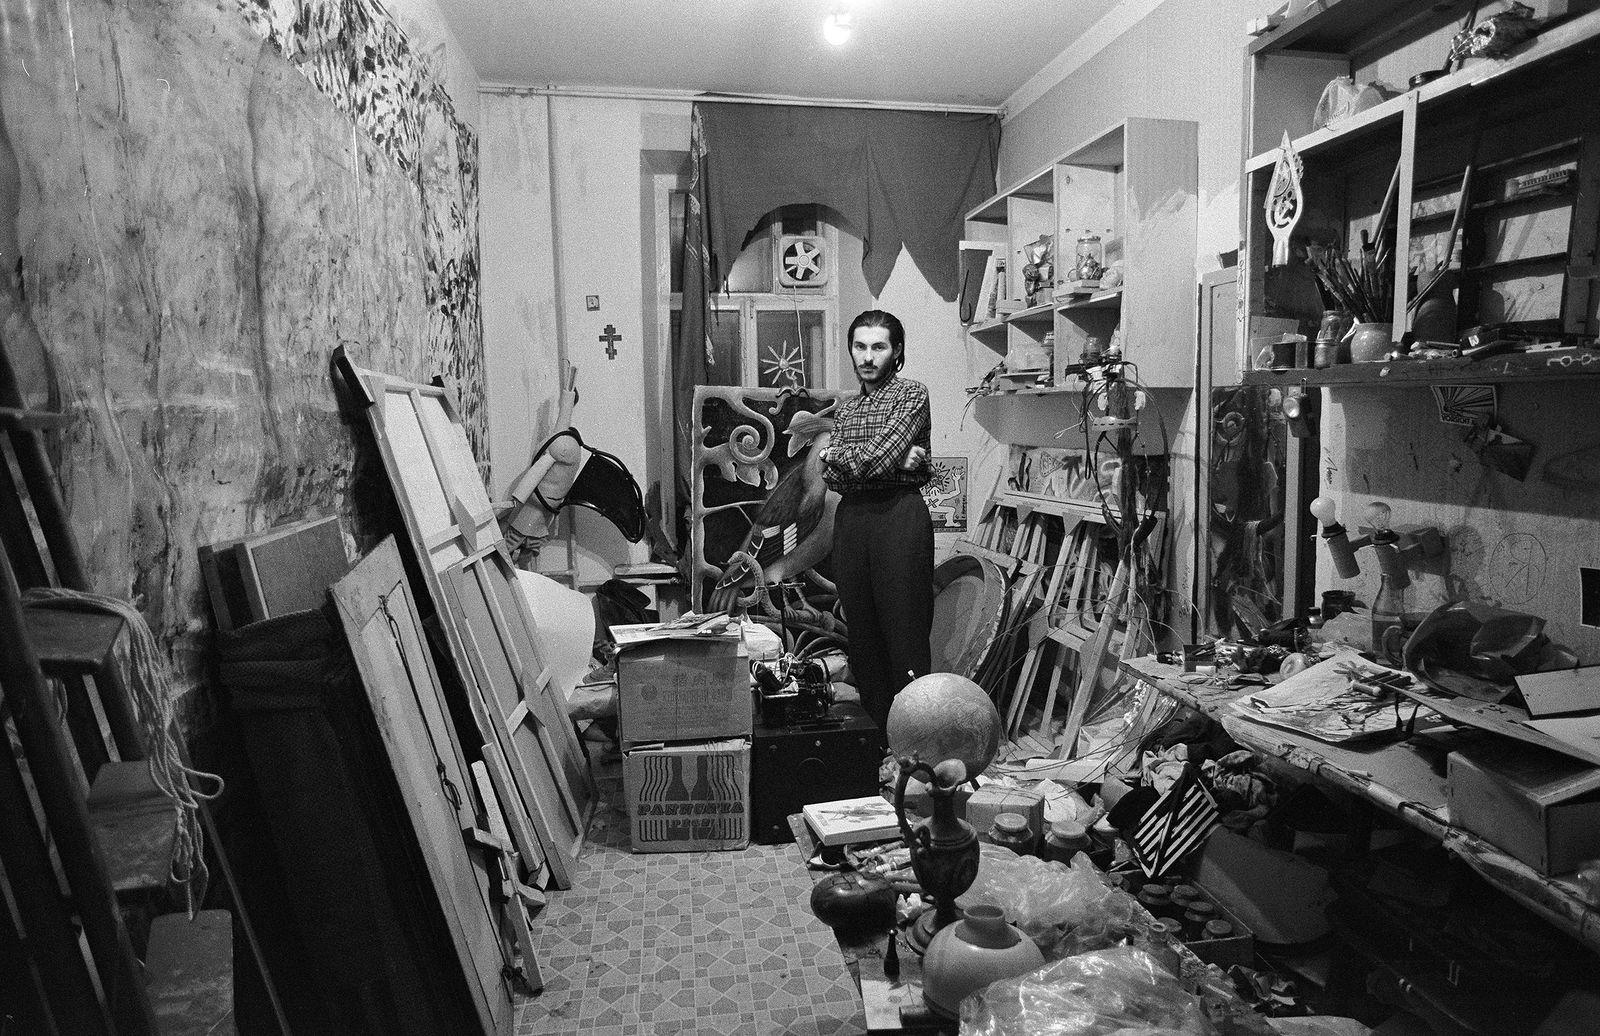 Андрей Безукладников. Совриск. Георгий Острецов. Москва. 1987